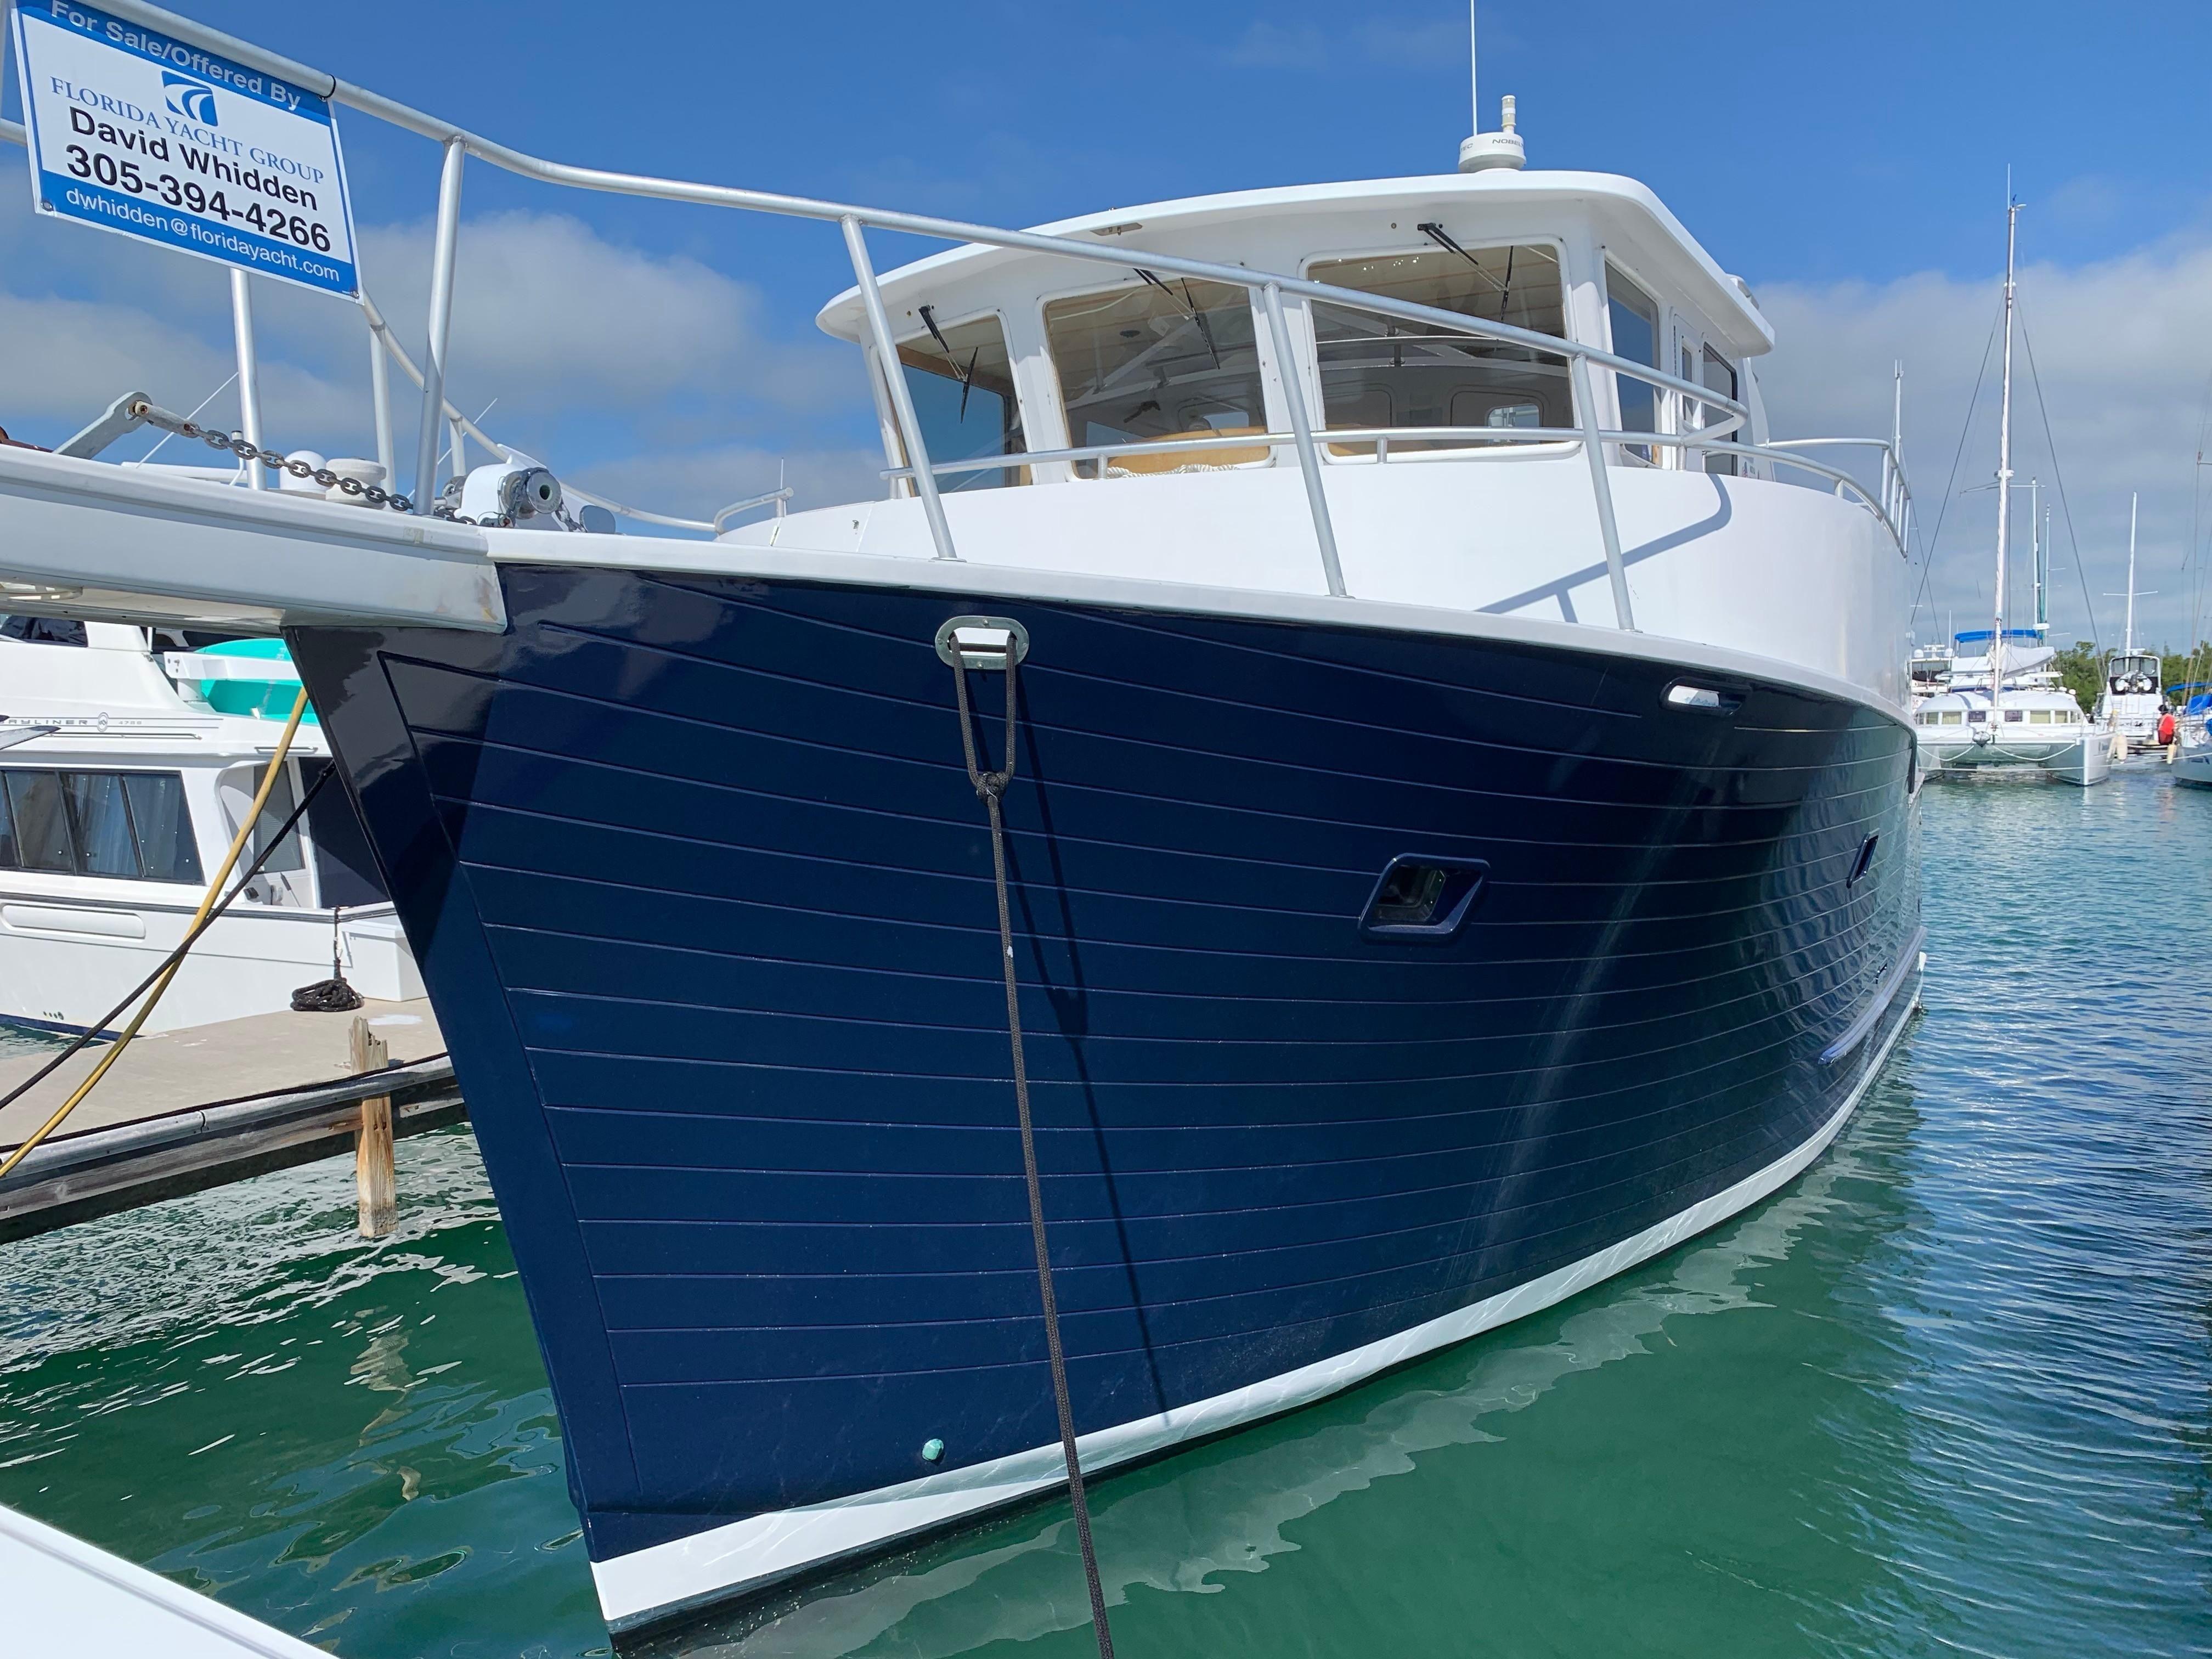 2002 Magna Marine Nova Scotia 43 Power Boat For Sale Www